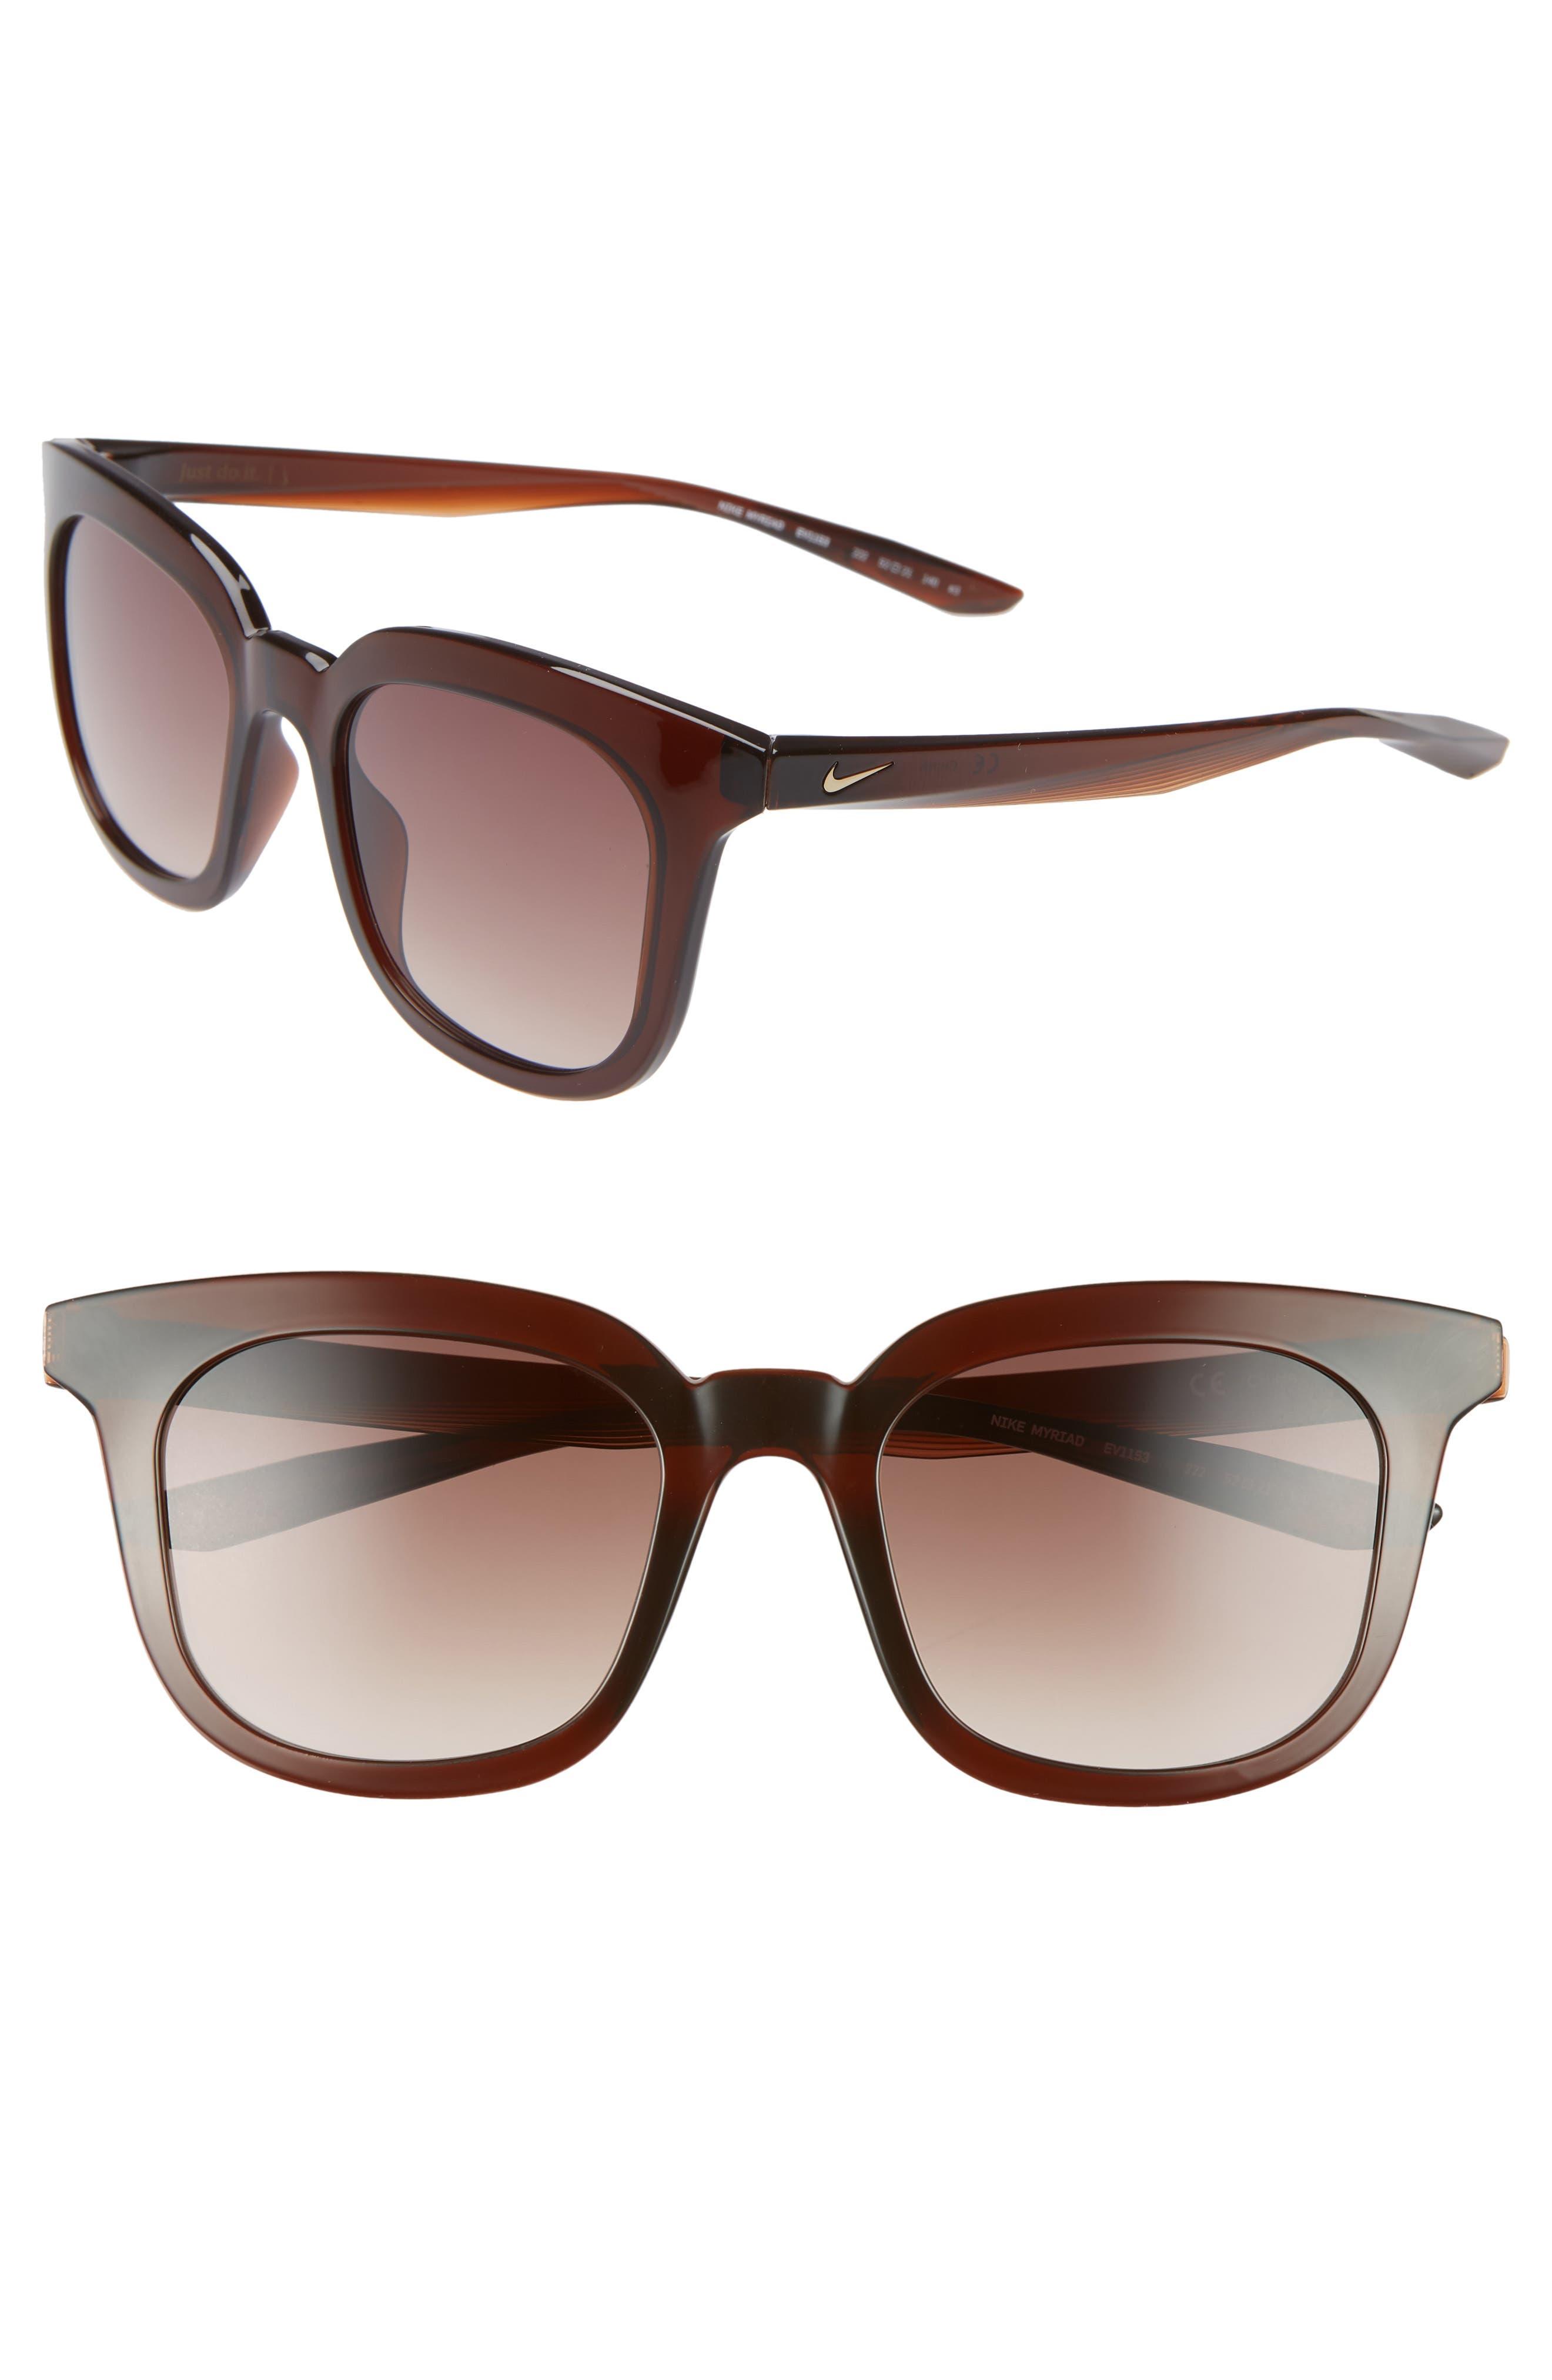 Nike Myriad 52Mm Square Sunglasses - Burgundy/ Gradient Brown